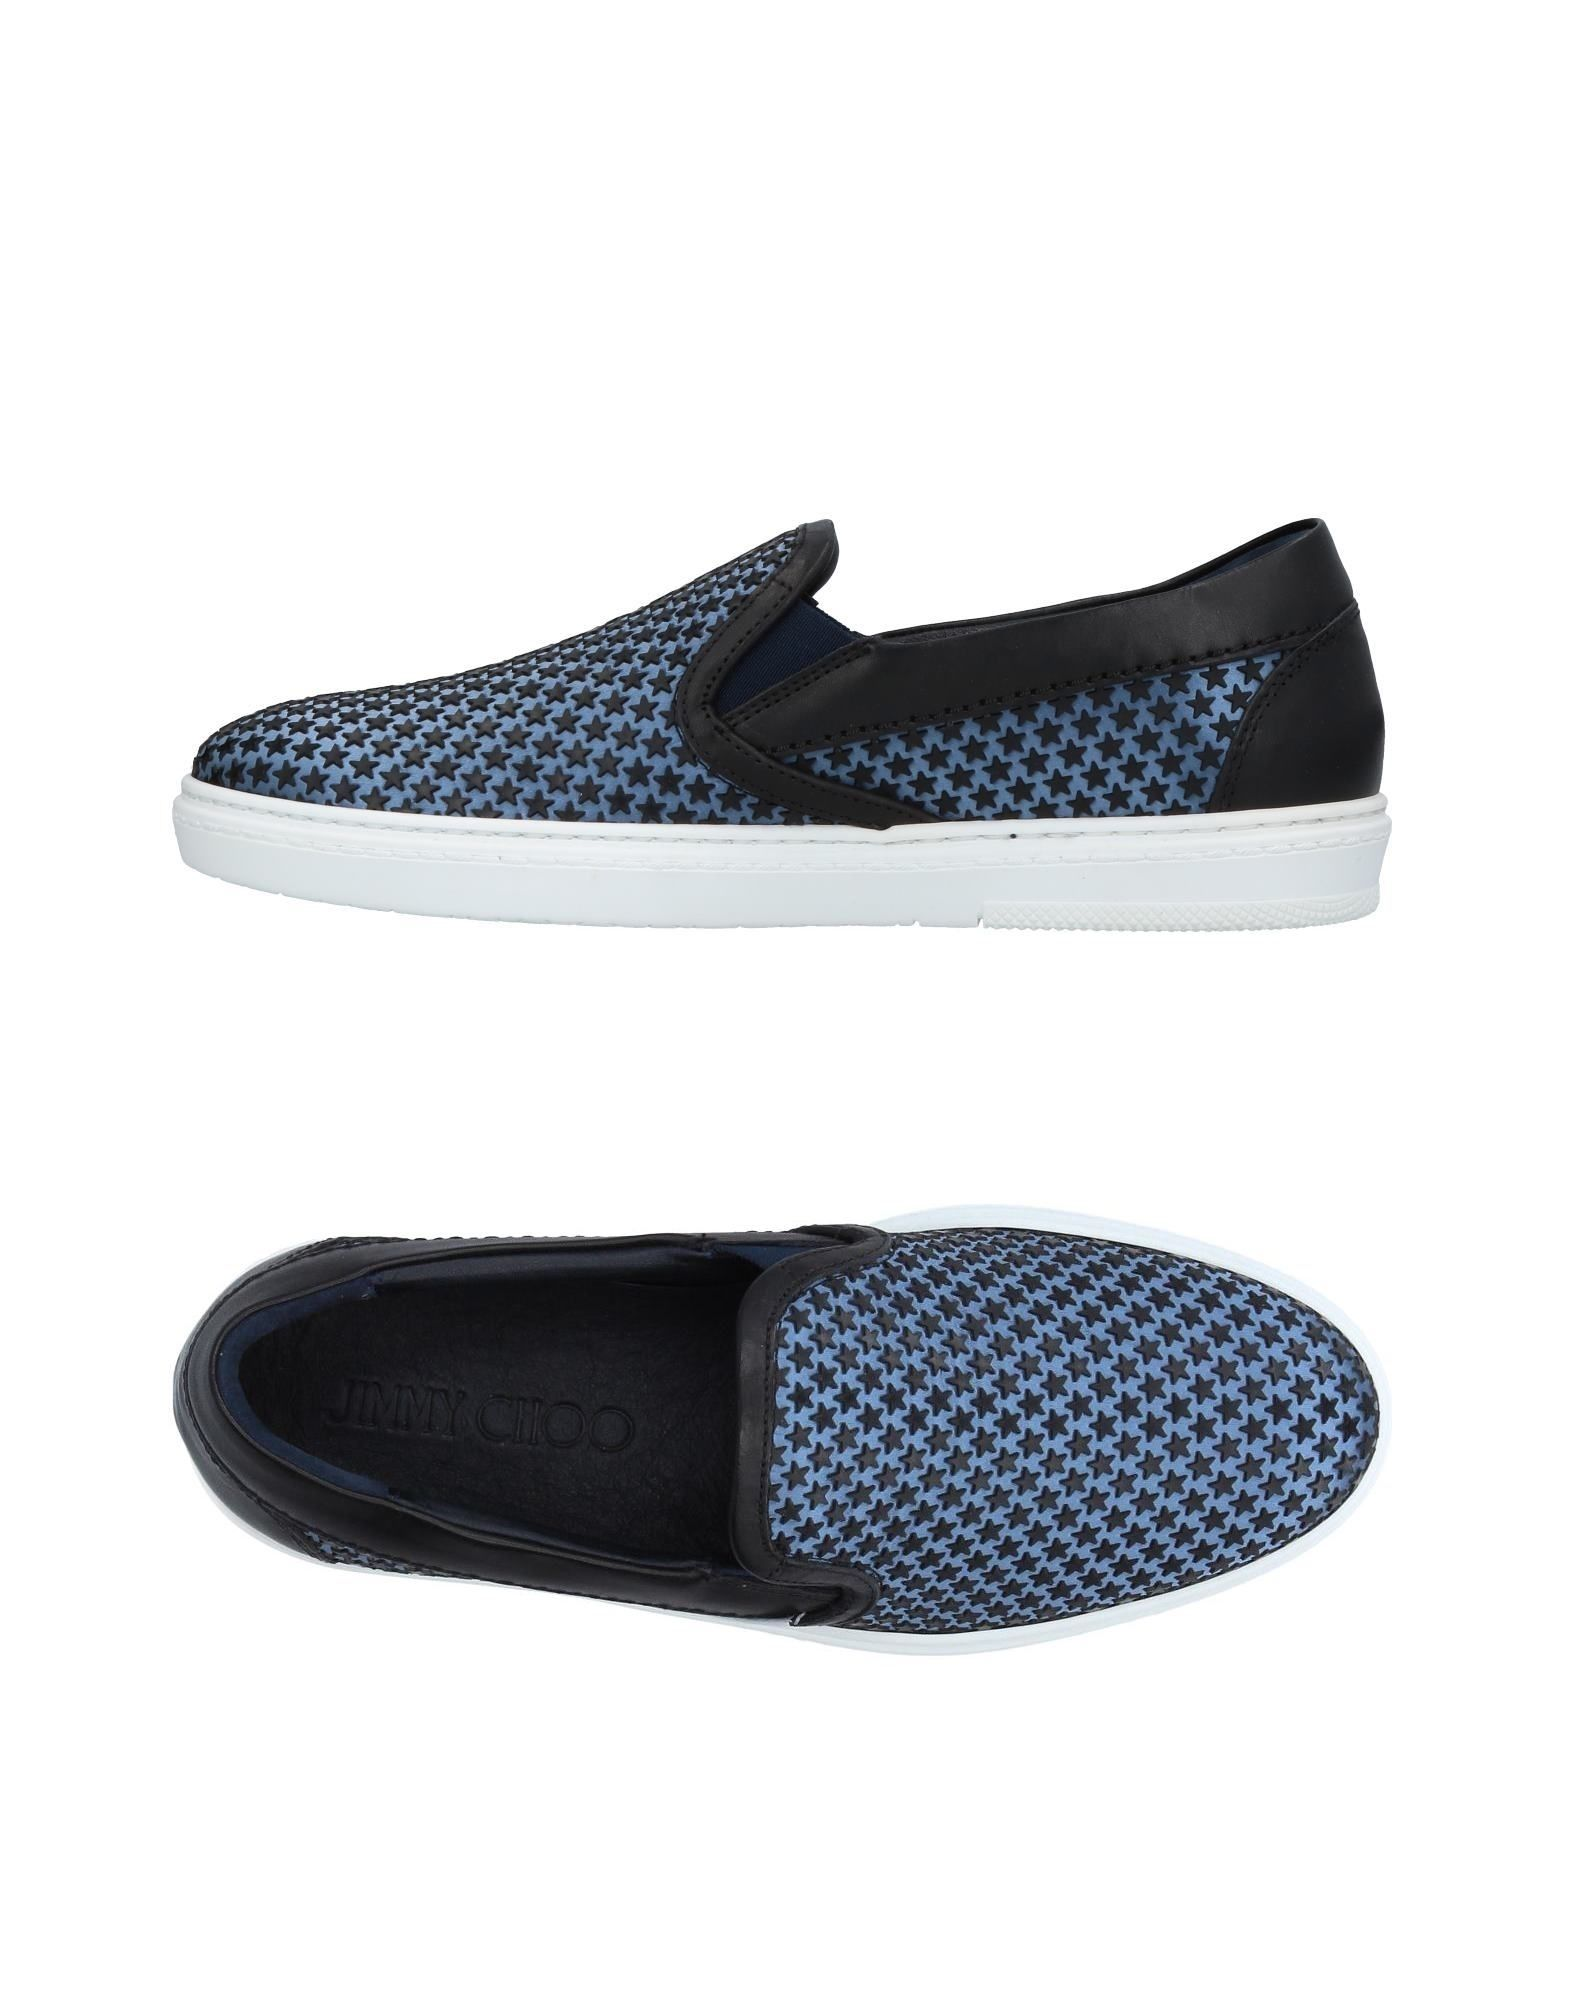 Sneakers Jimmy Choo Uomo - Acquista online su